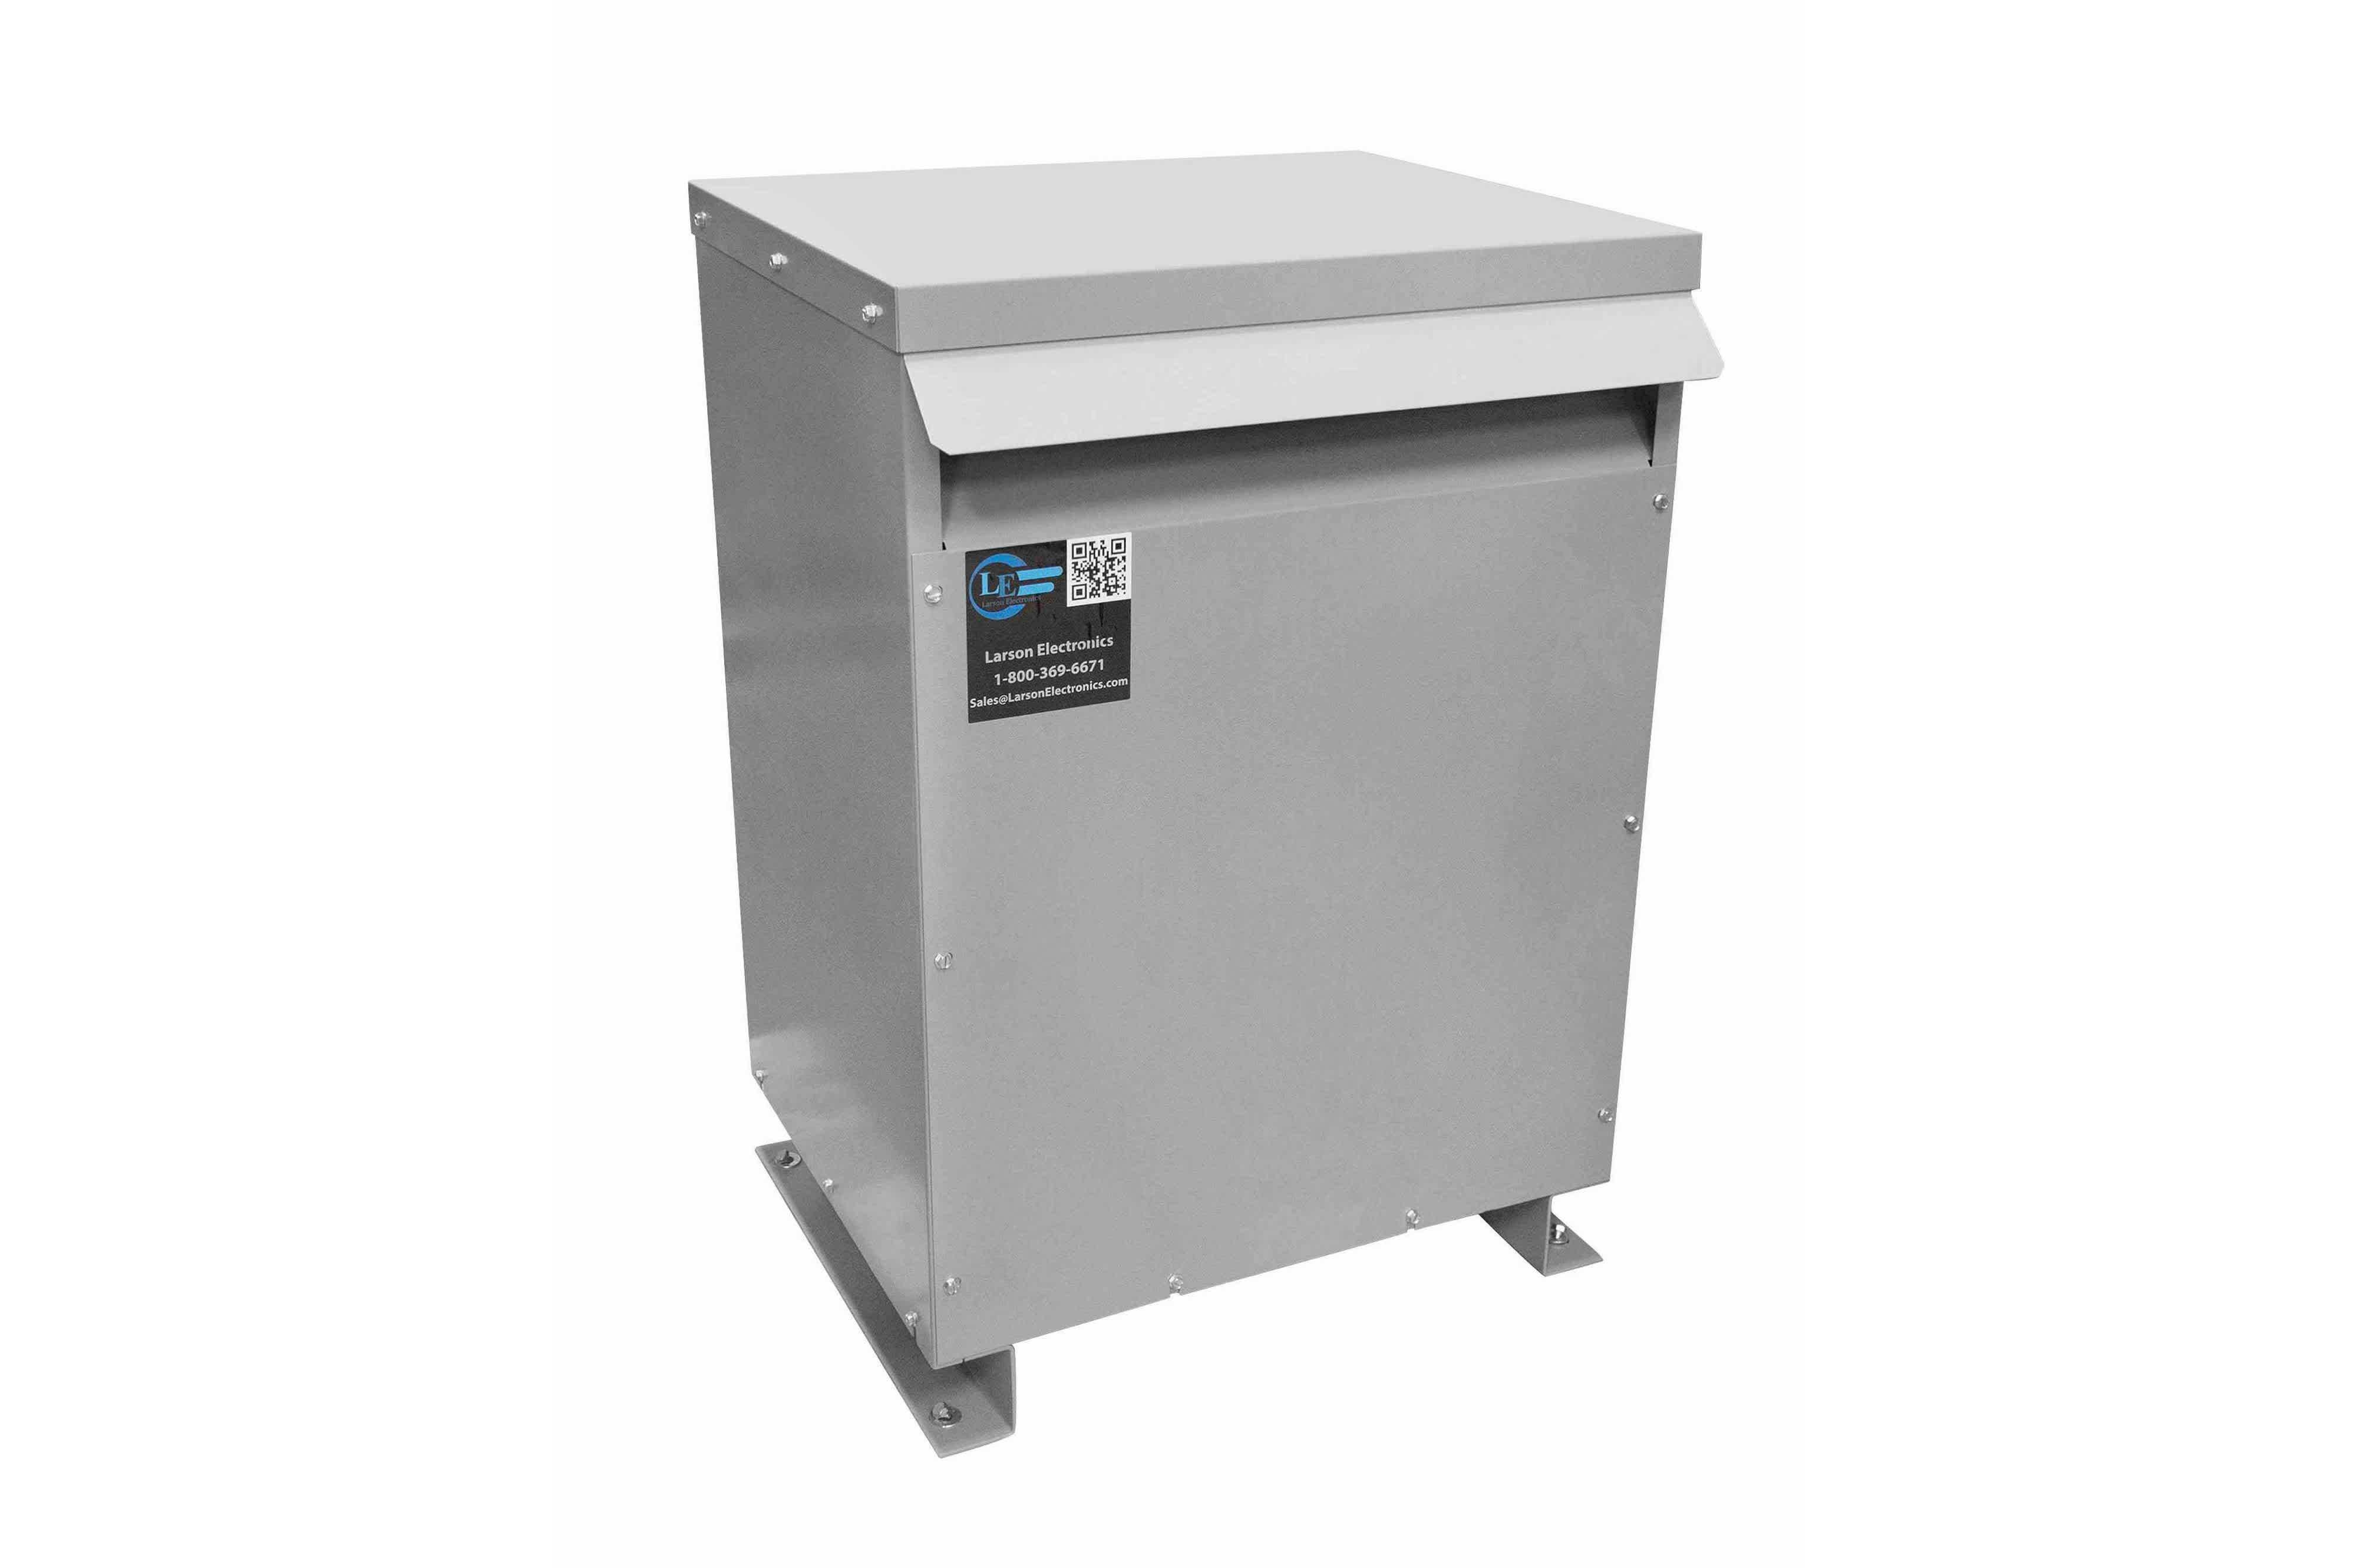 65 kVA 3PH Isolation Transformer, 460V Wye Primary, 600V Delta Secondary, N3R, Ventilated, 60 Hz